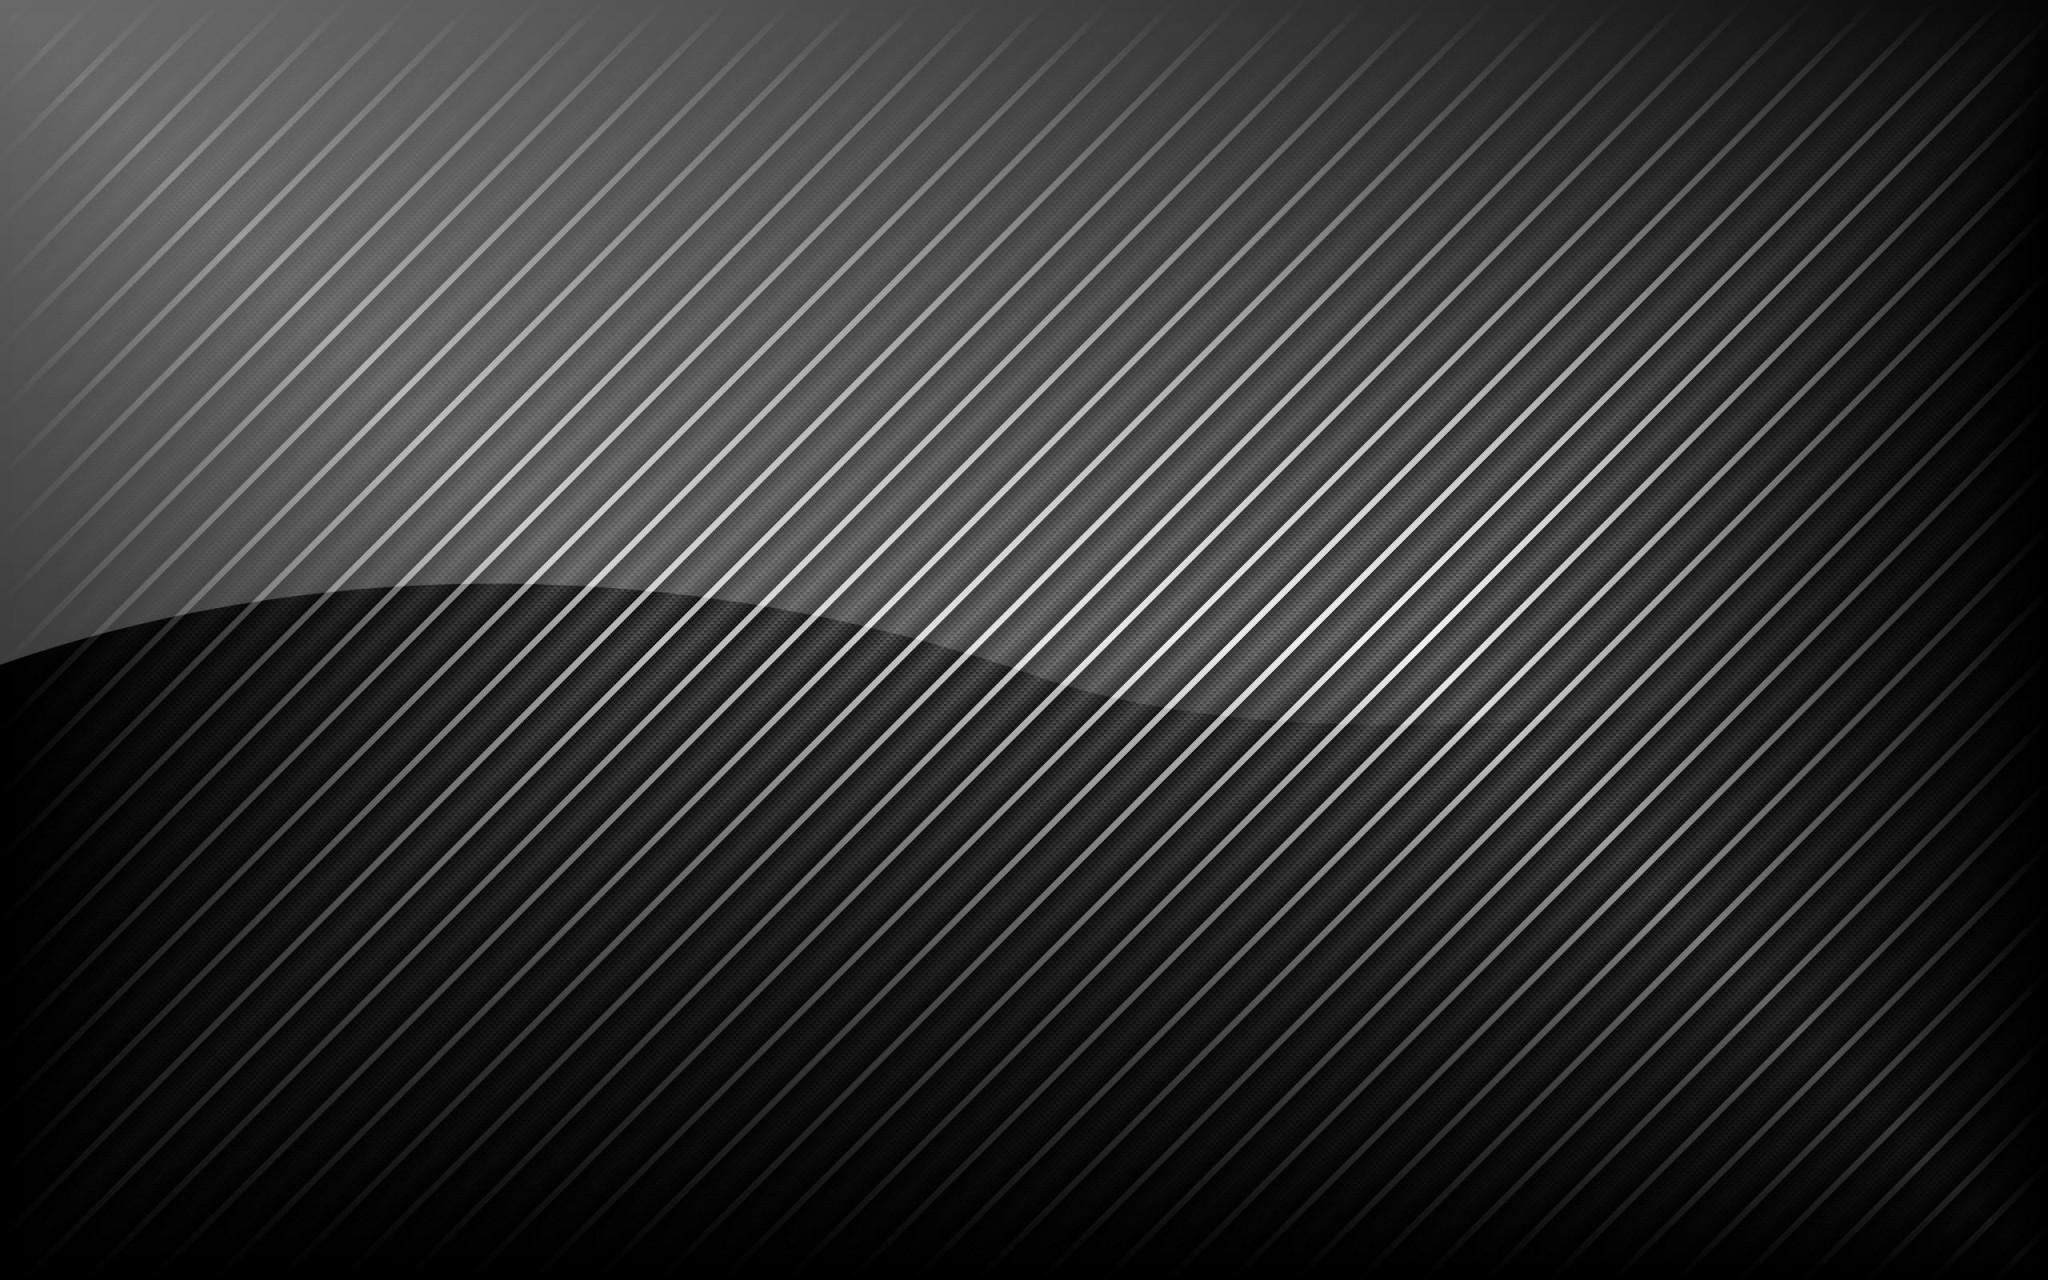 carbon fiber computer backgrounds wallpaper